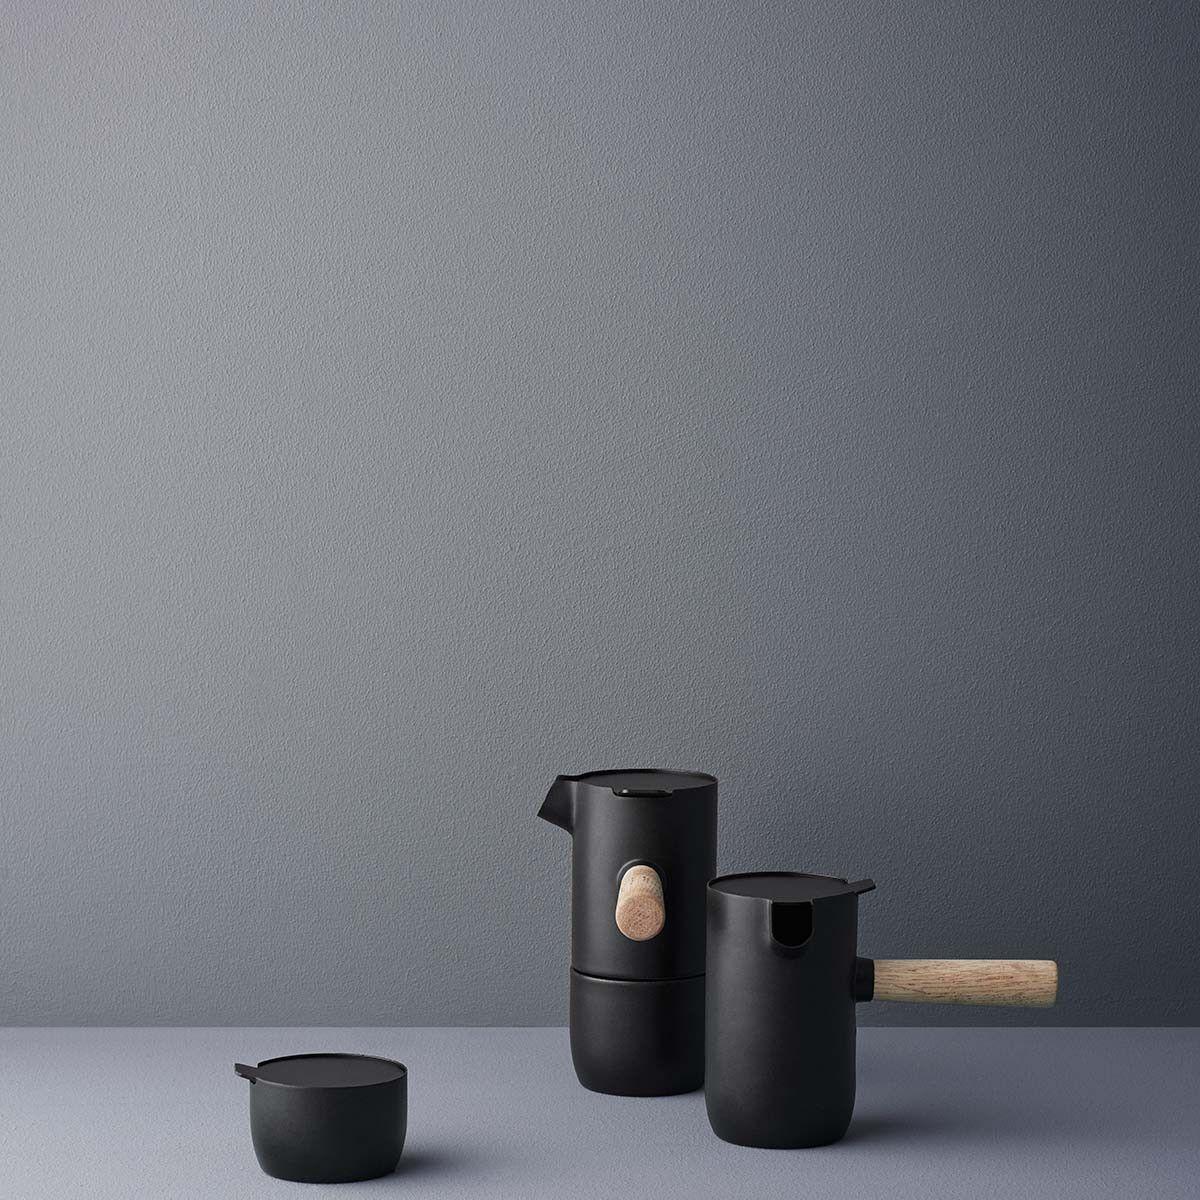 Stelton - Collar Espresso Maker #espressoathome